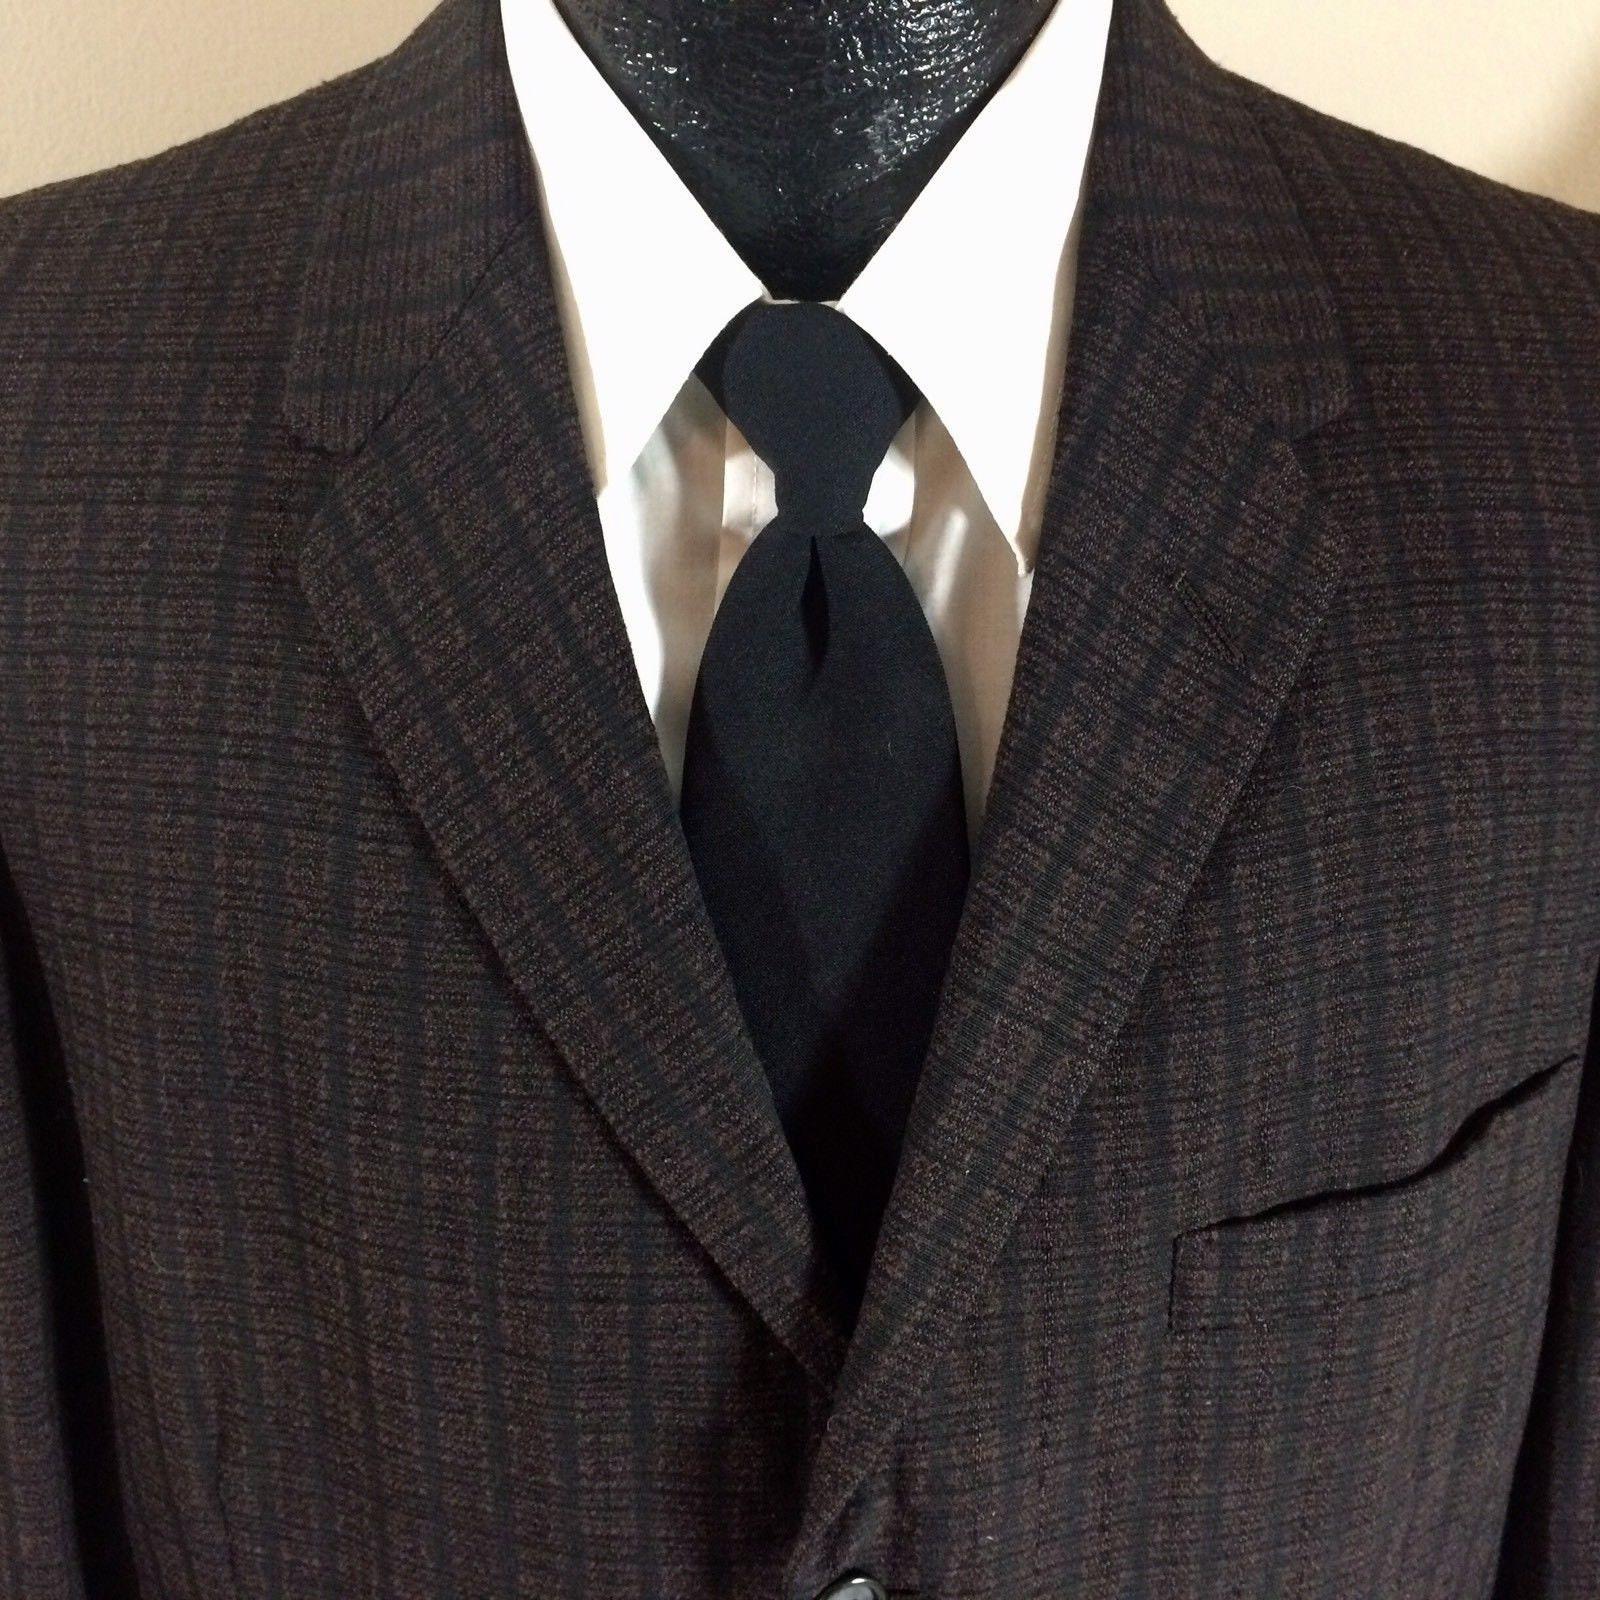 1950s Men's Ties, Bow Ties – Vintage, Skinny, Knit Vintage 50s Penneys Mens Black Brown Check Sport Coat Rockabilly 3-Btn Jacket Textured Wool Blazer 42 L $129.99 AT vintagedancer.com